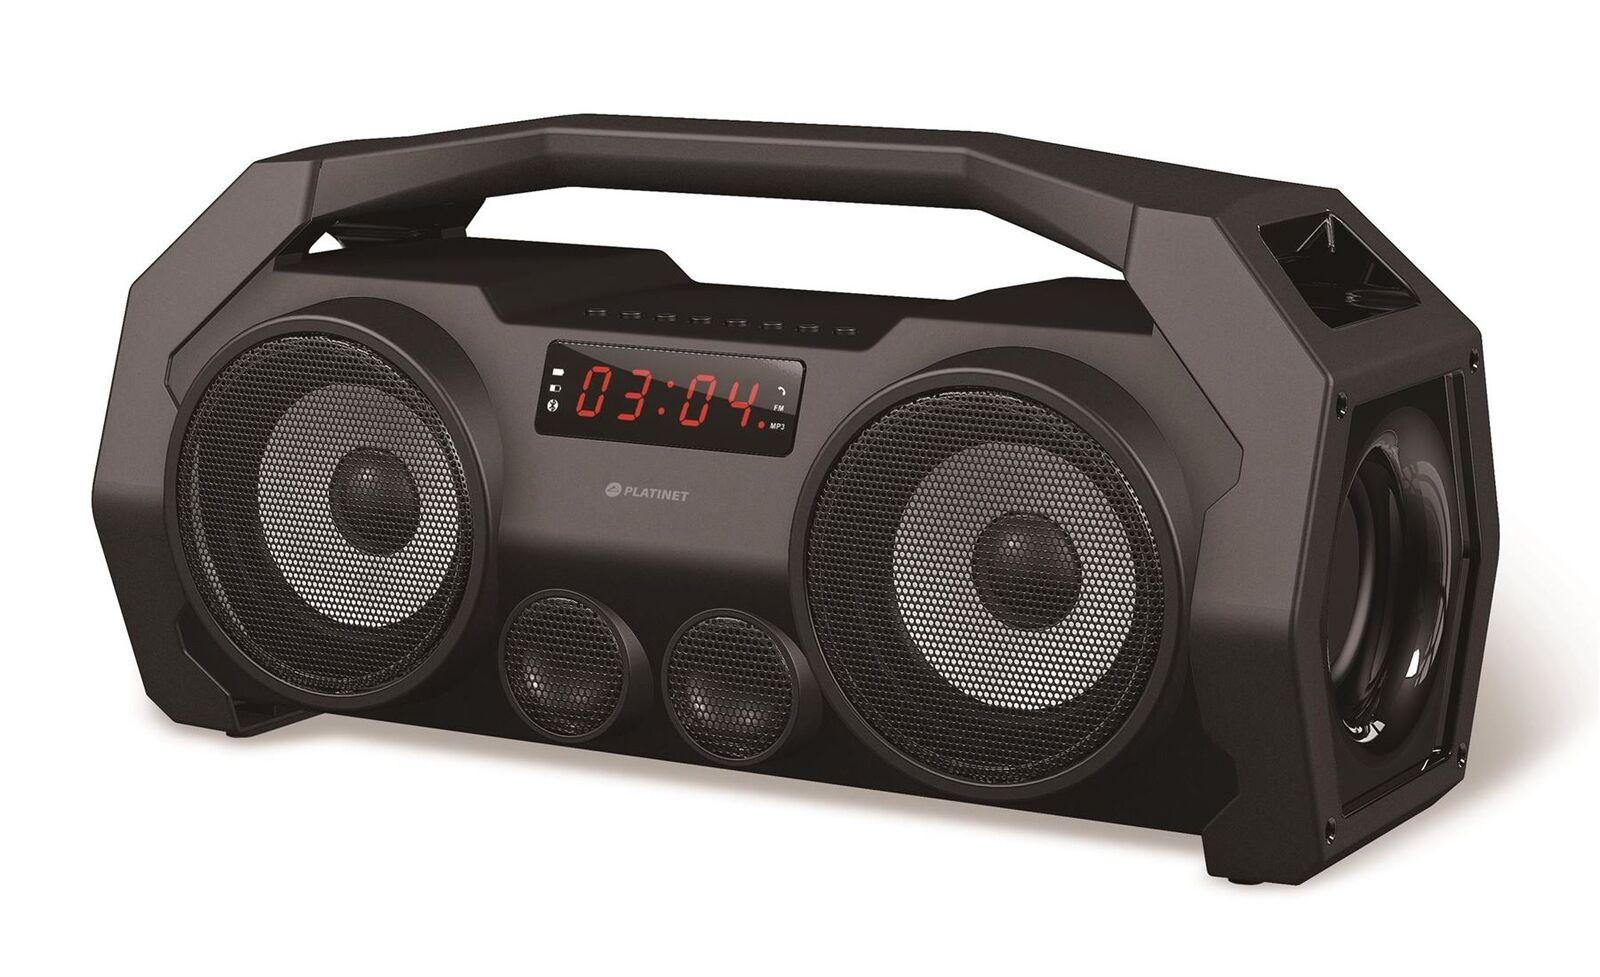 Platinet Boombox Portable Stereo Bluetooth Speakers Megasound Hi-Fi Super Bass - £46.99 delivered @ ezoneuk / eBay